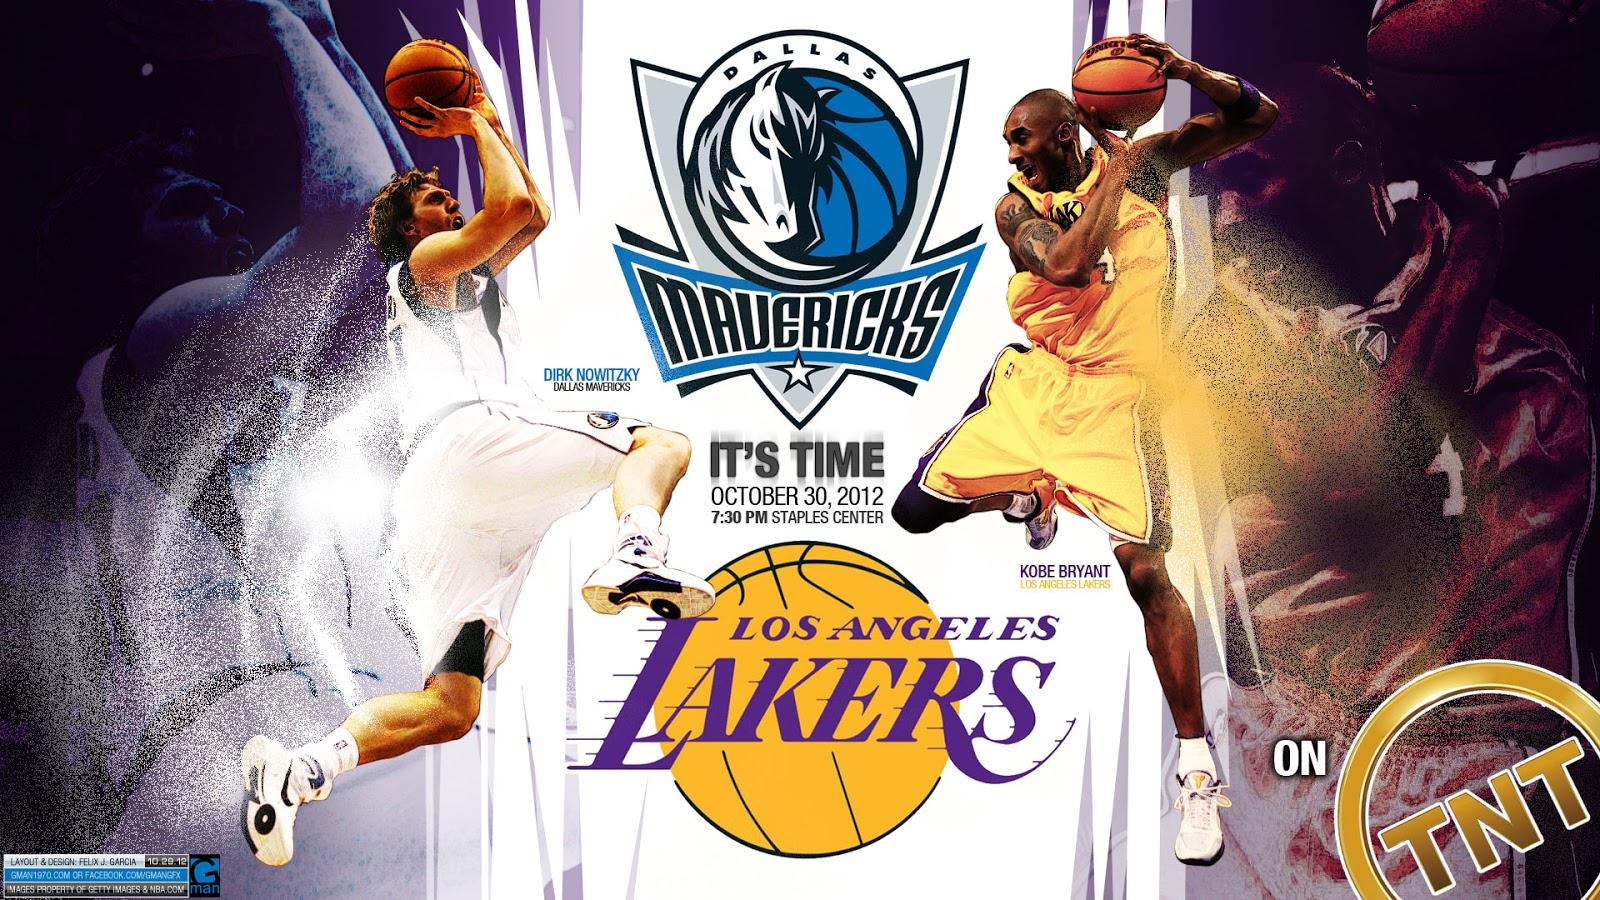 http://2.bp.blogspot.com/-T1ZZ7FBX1lo/UJFERaLyDFI/AAAAAAAABSI/RPiQvm_p49A/s1600/Lakers-Mavs-2012-NBA-1920x1080-BasketWallpapers.com-.jpg